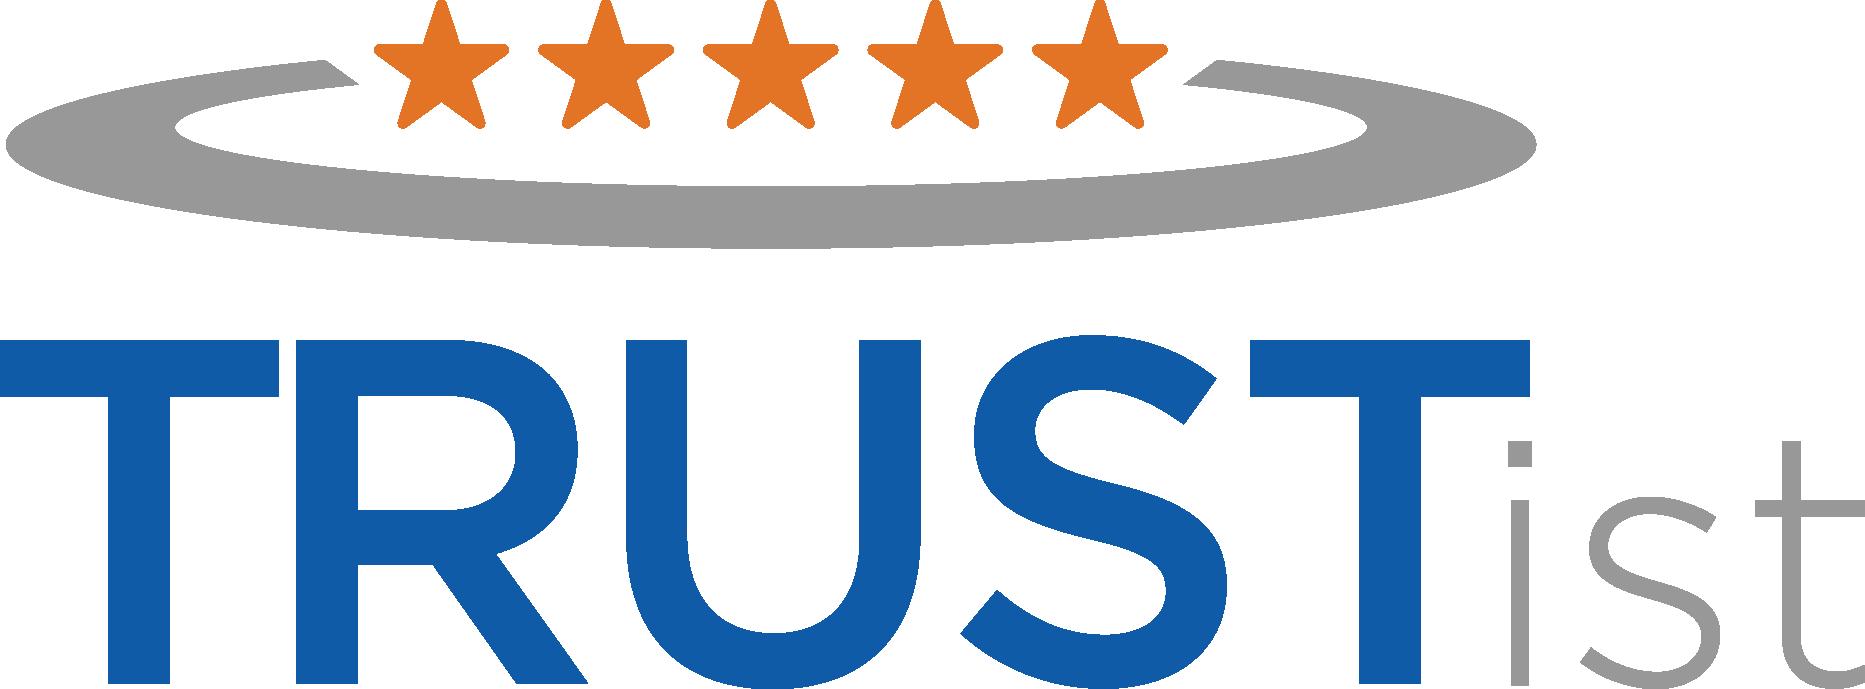 5-star-ciustomer-reviews-building-services-balham